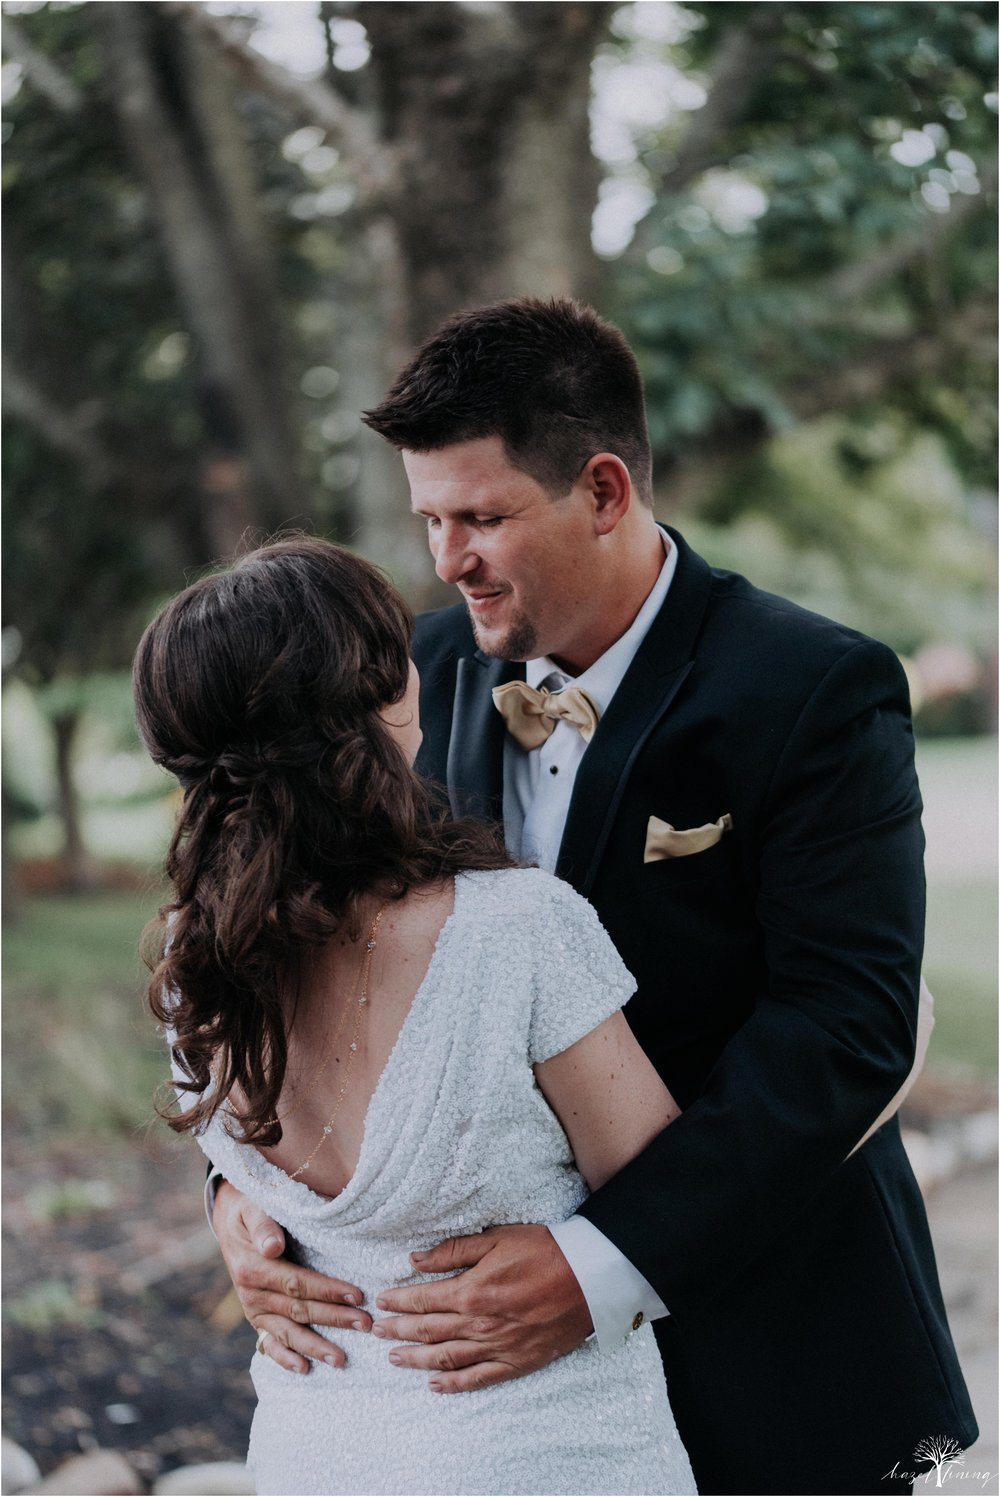 elizabeth-doelp-andrew-foreback-middletown-country-club-summer-langhorne-pennsylvania-wedding-hazel-lining-travel-wedding-elopement-photography_0035.jpg